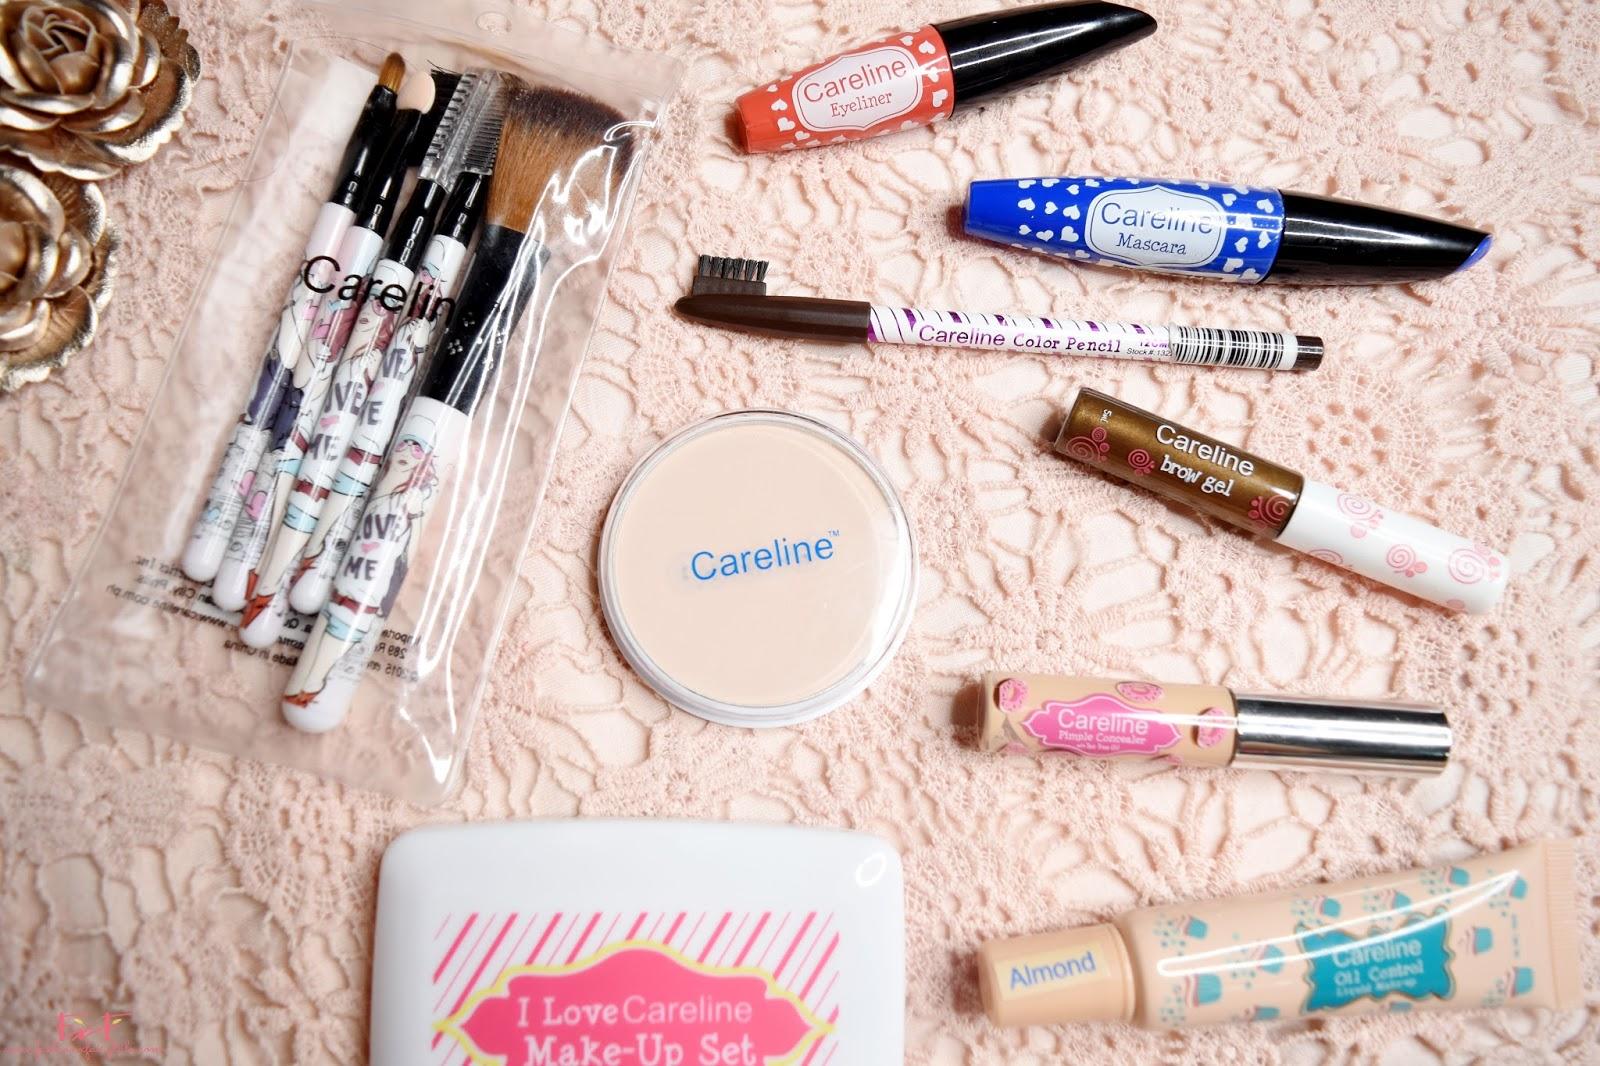 Brand Focus: Careline – First Impressions